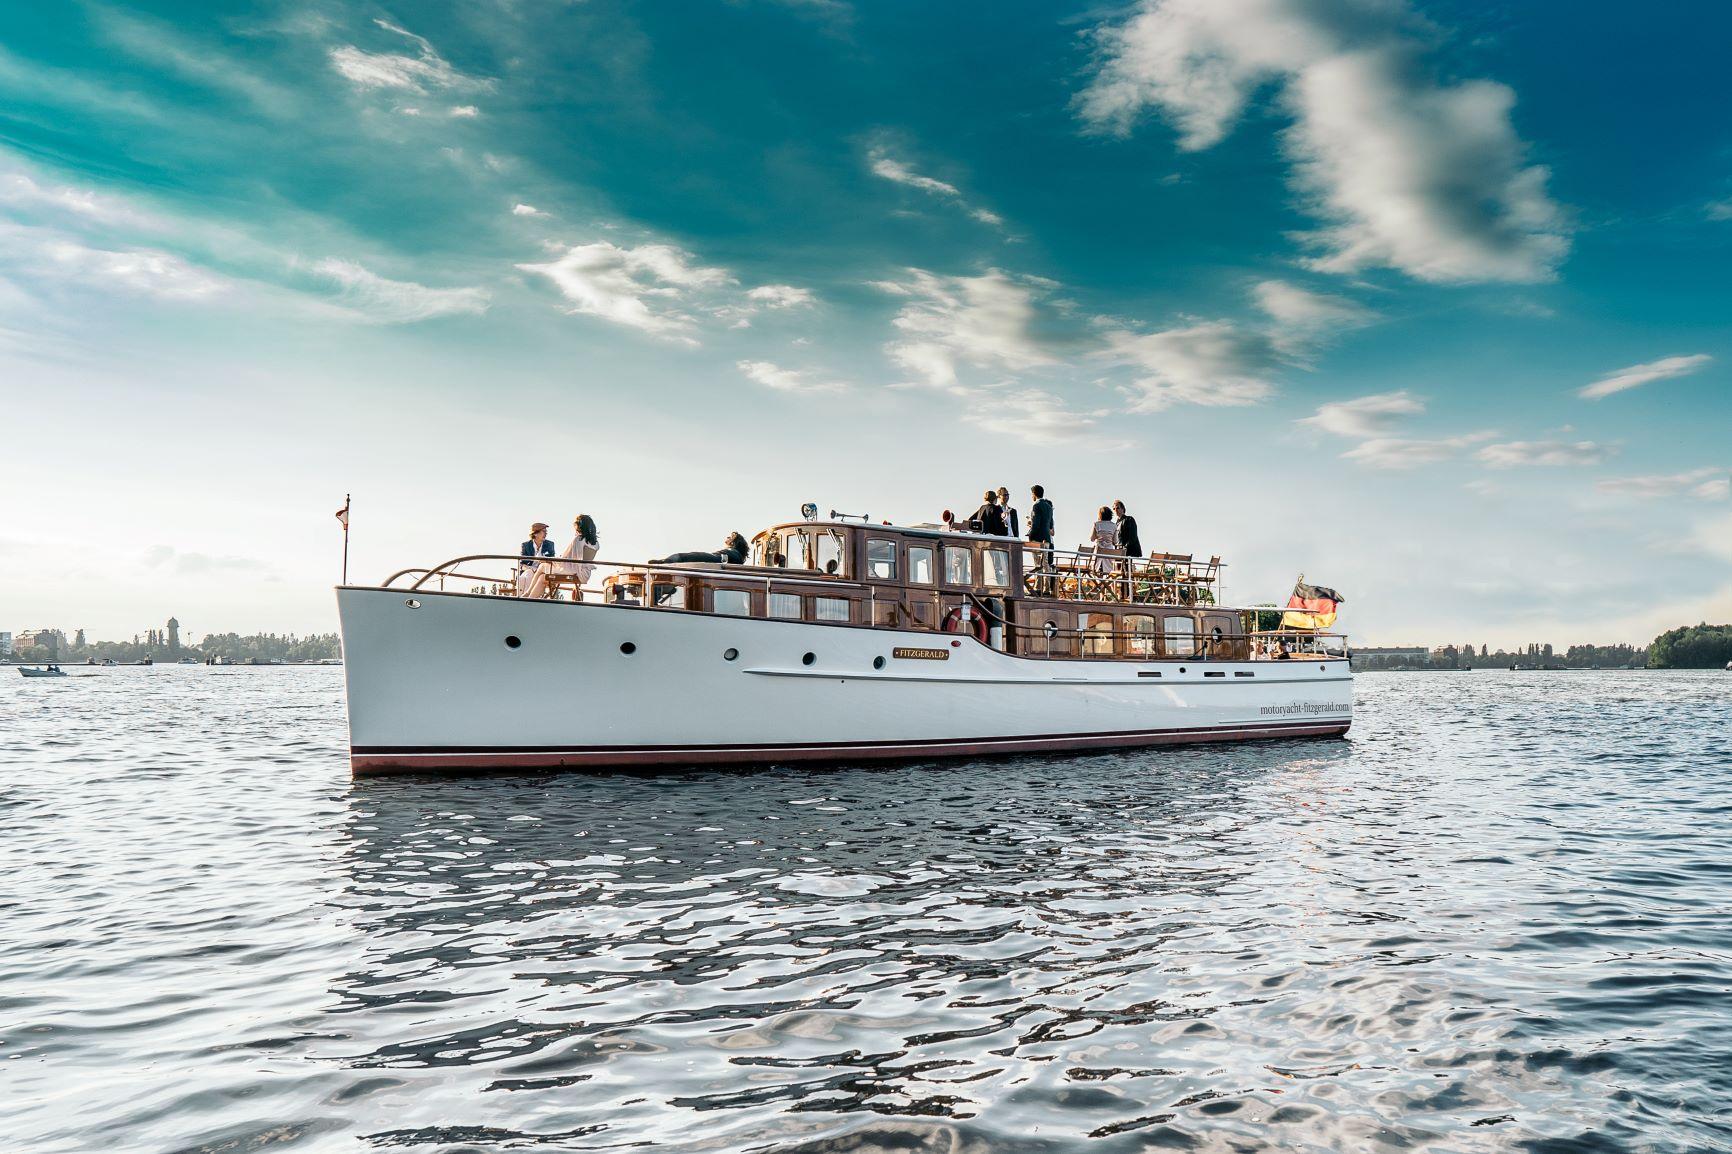 Fitzgerald Backbord Schiff Hochzeit Berlin